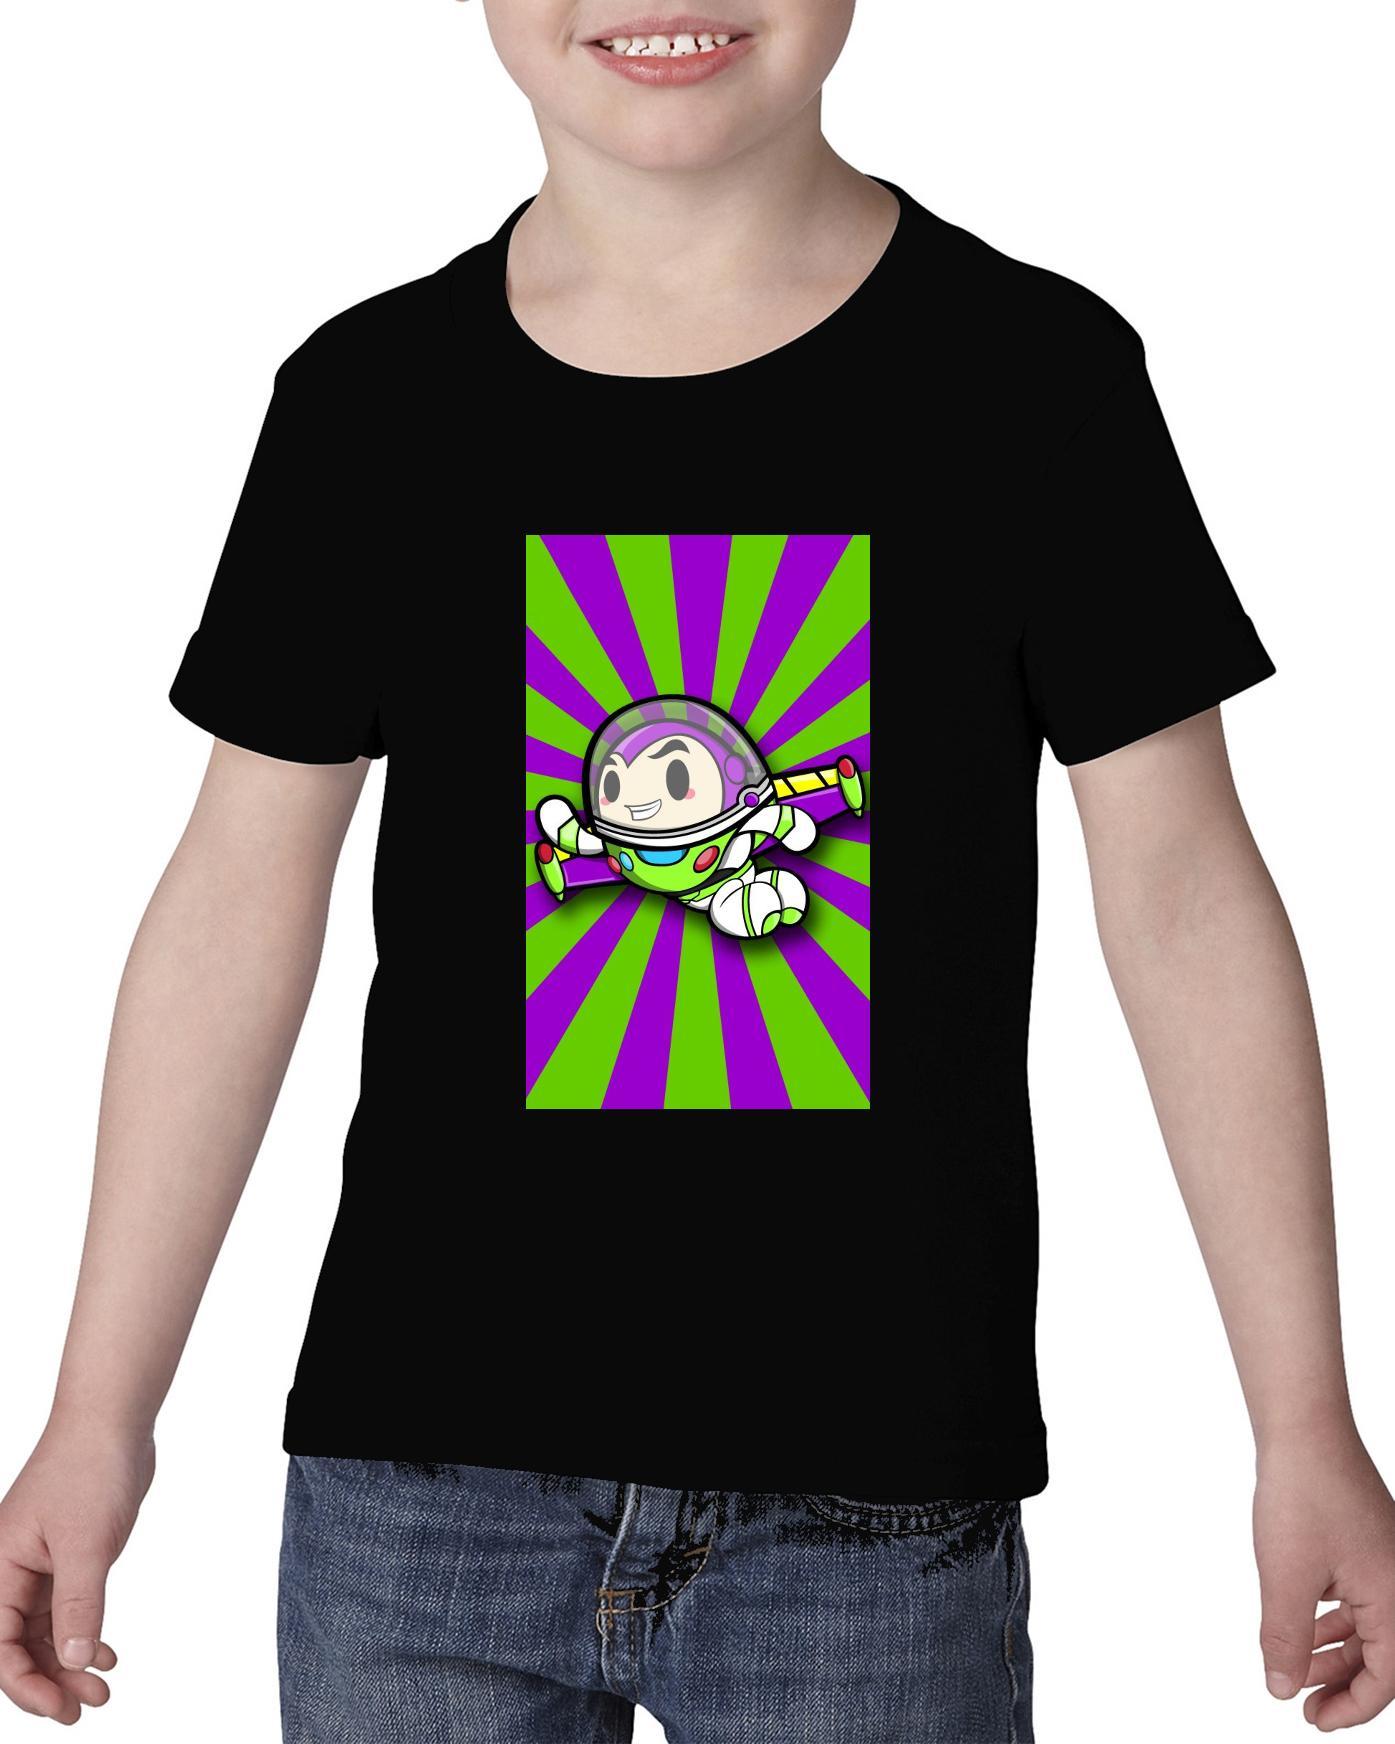 Camiseta niño buzz lightyear